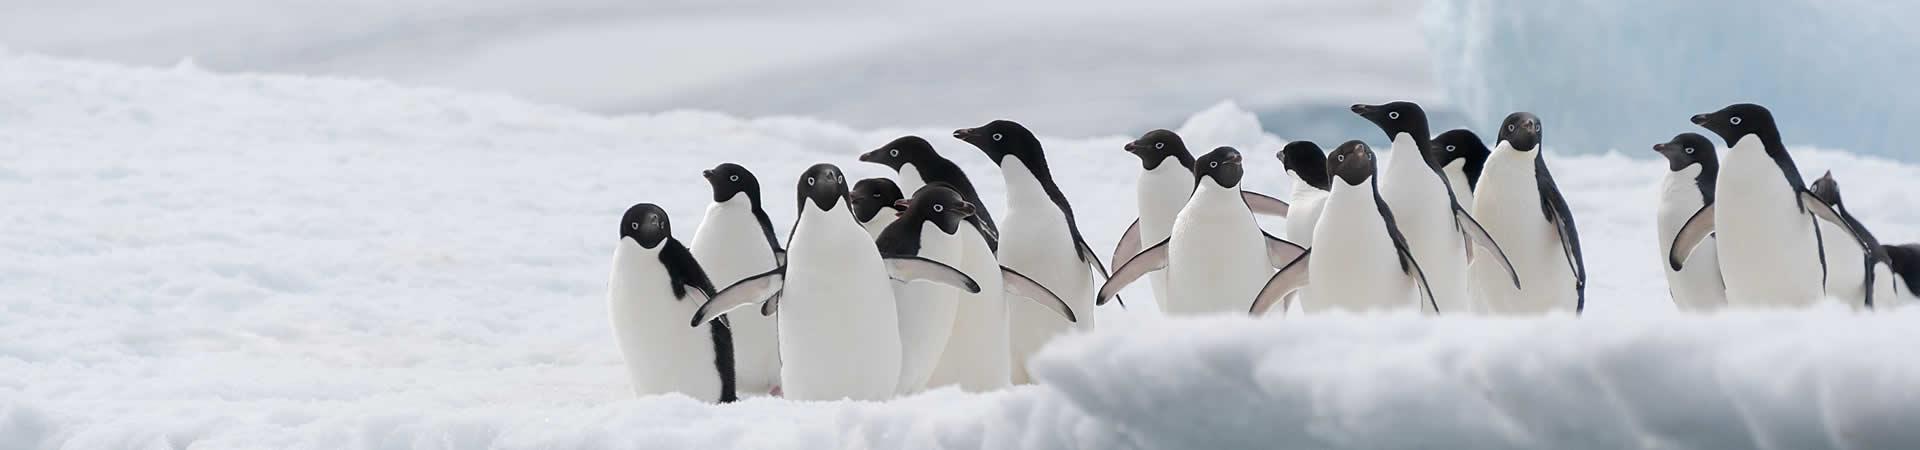 pinguins-energie-management